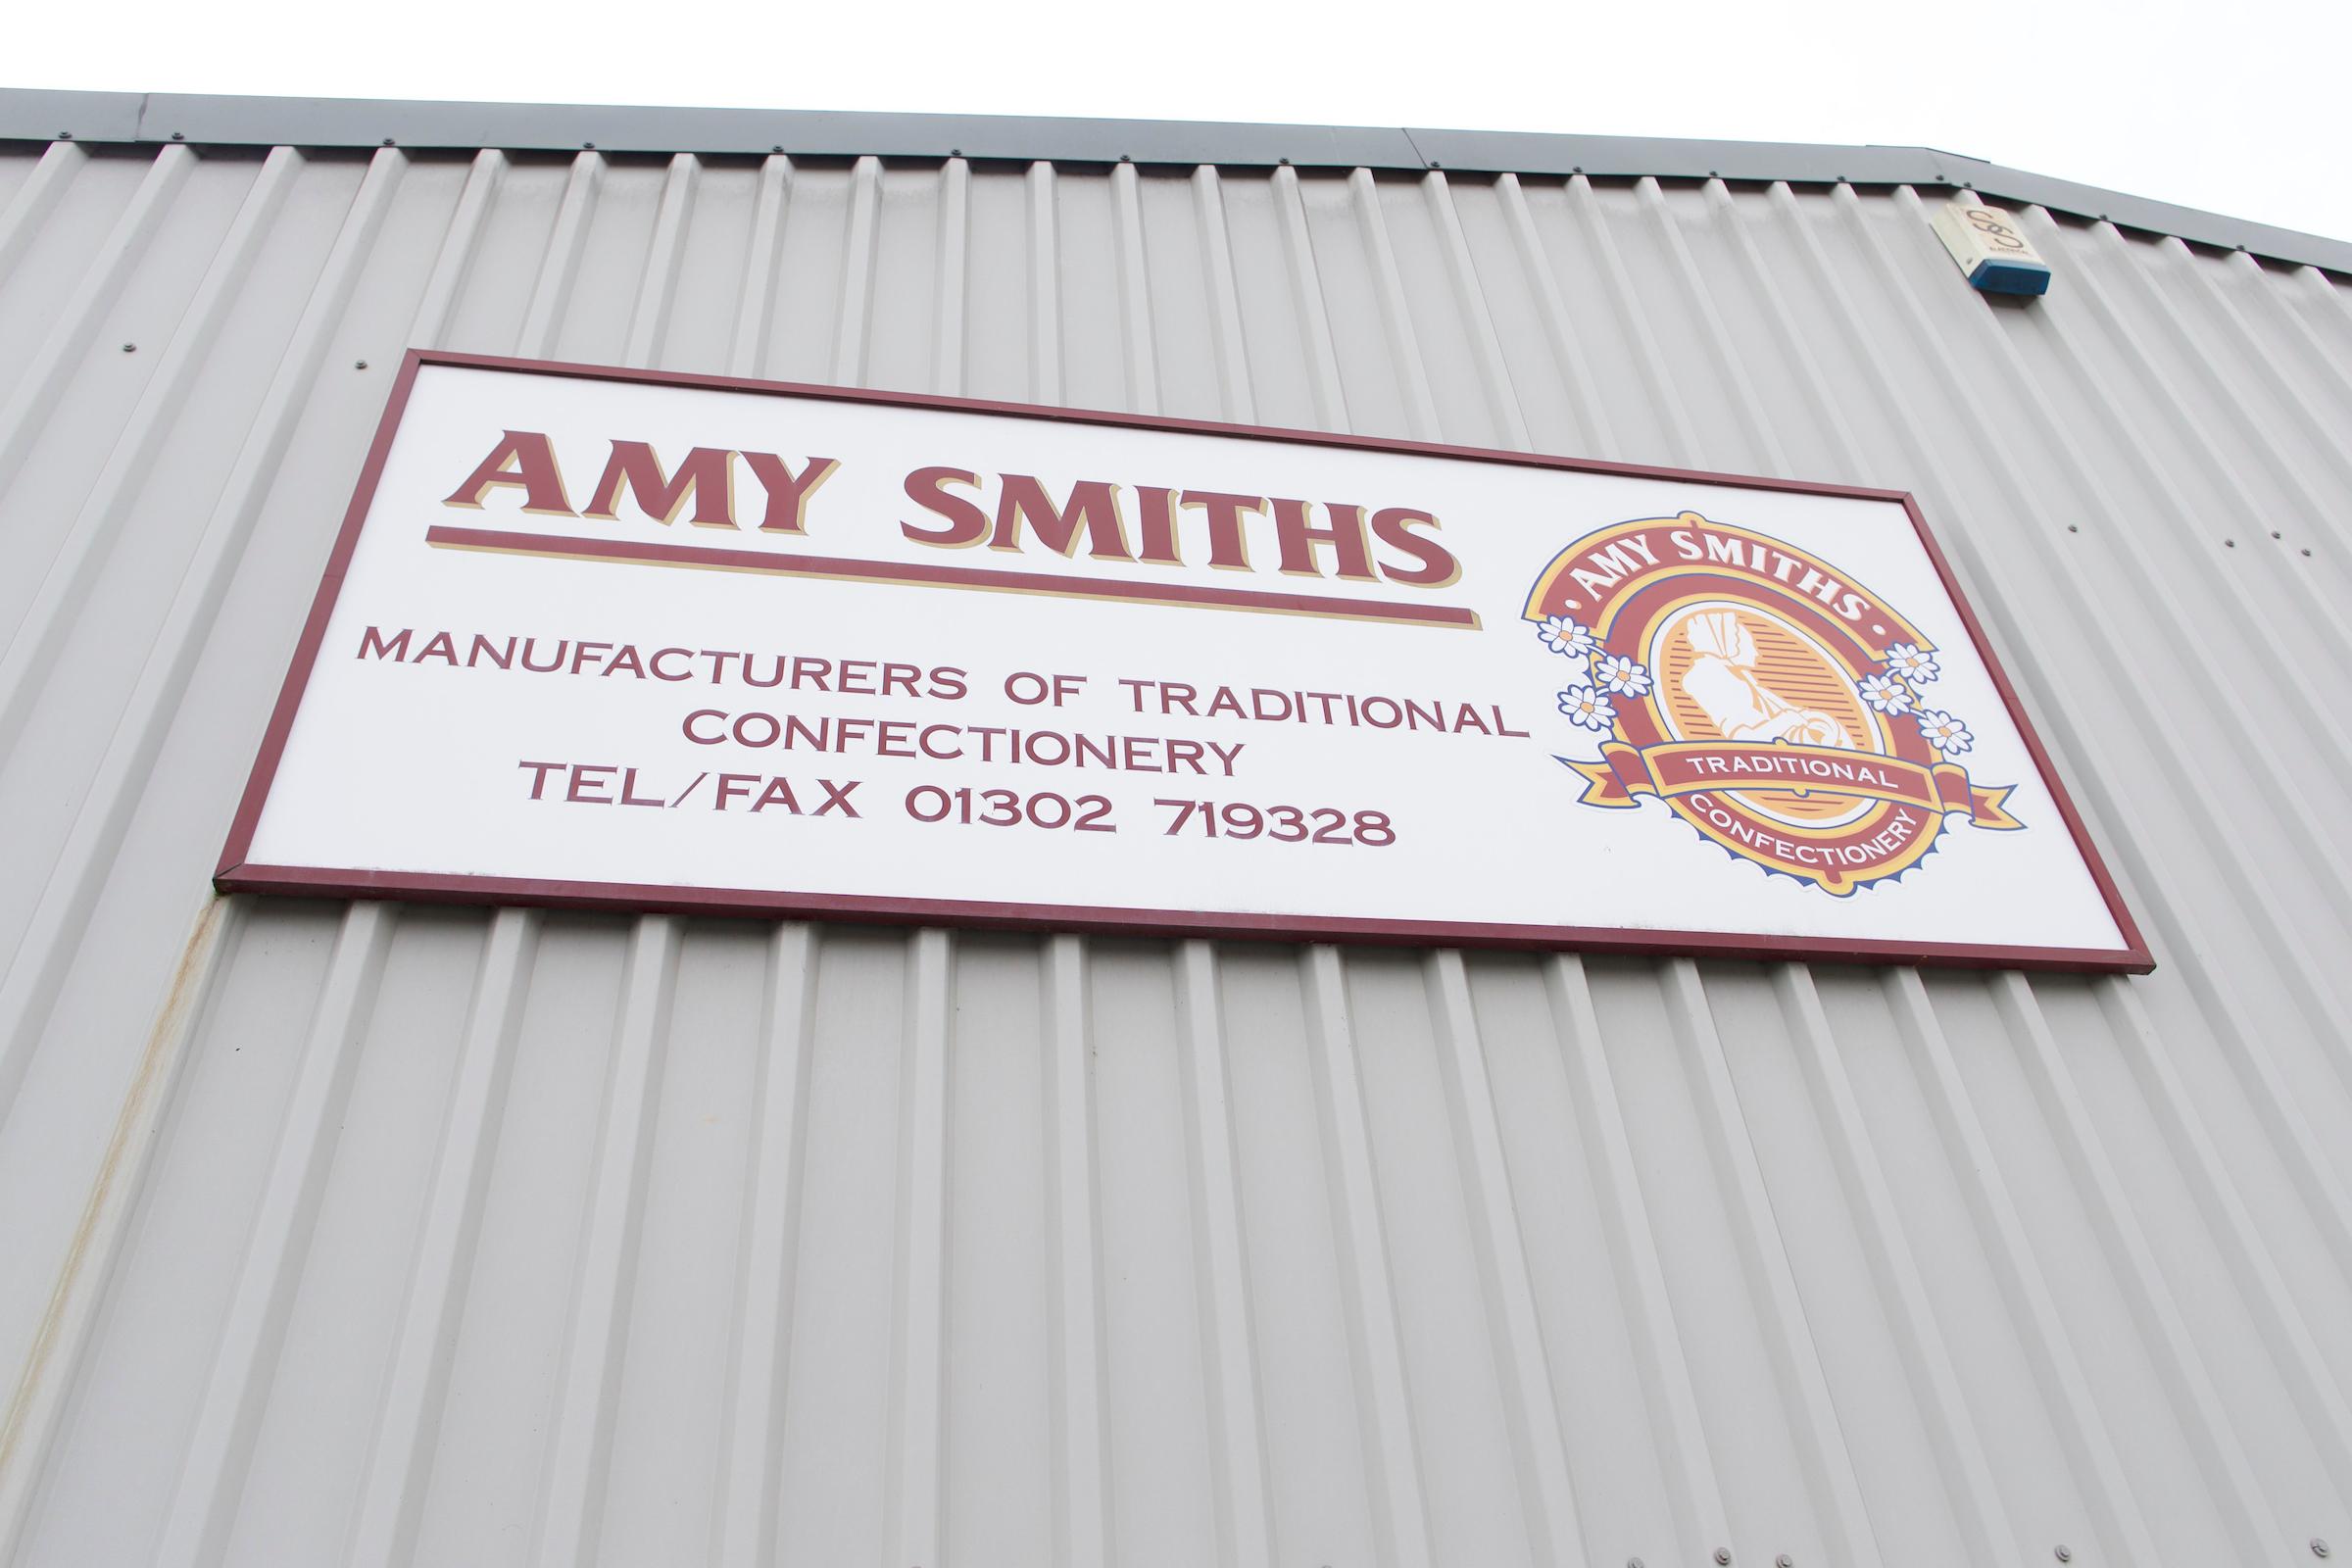 https://amysmiths.co.uk/wp-content/uploads/2017/03/amy-smiths-sign.jpg